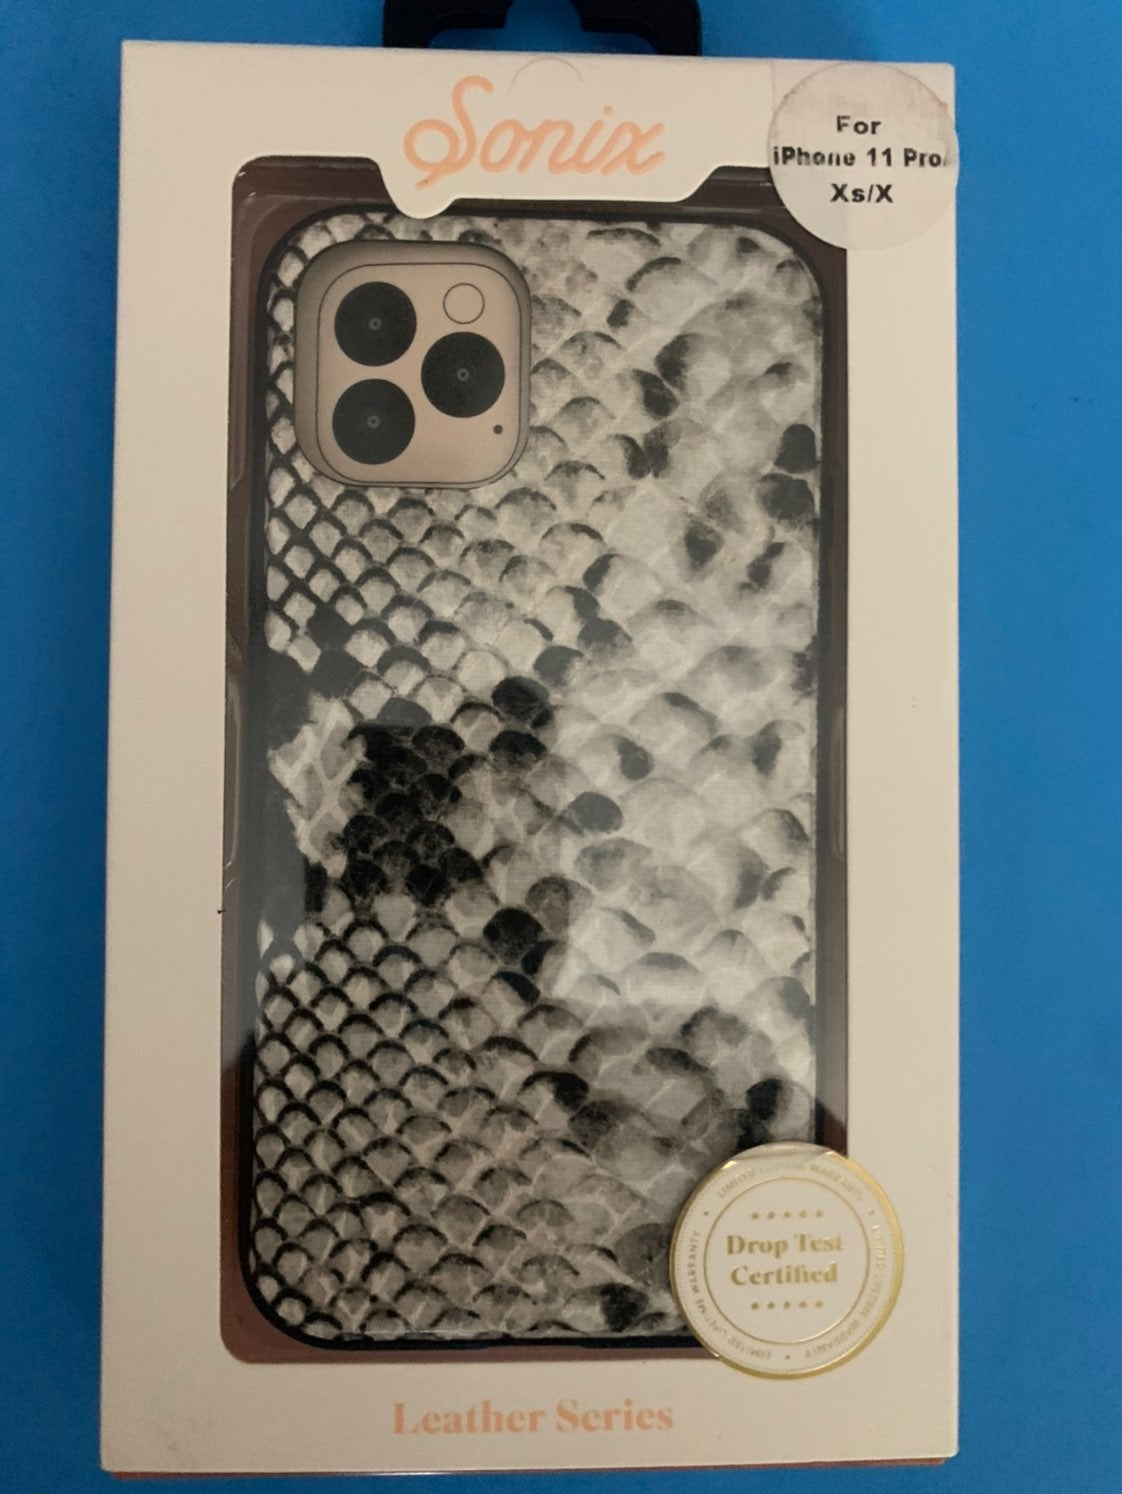 Sonix IPHONE 11 PRO/XS/X Leather case